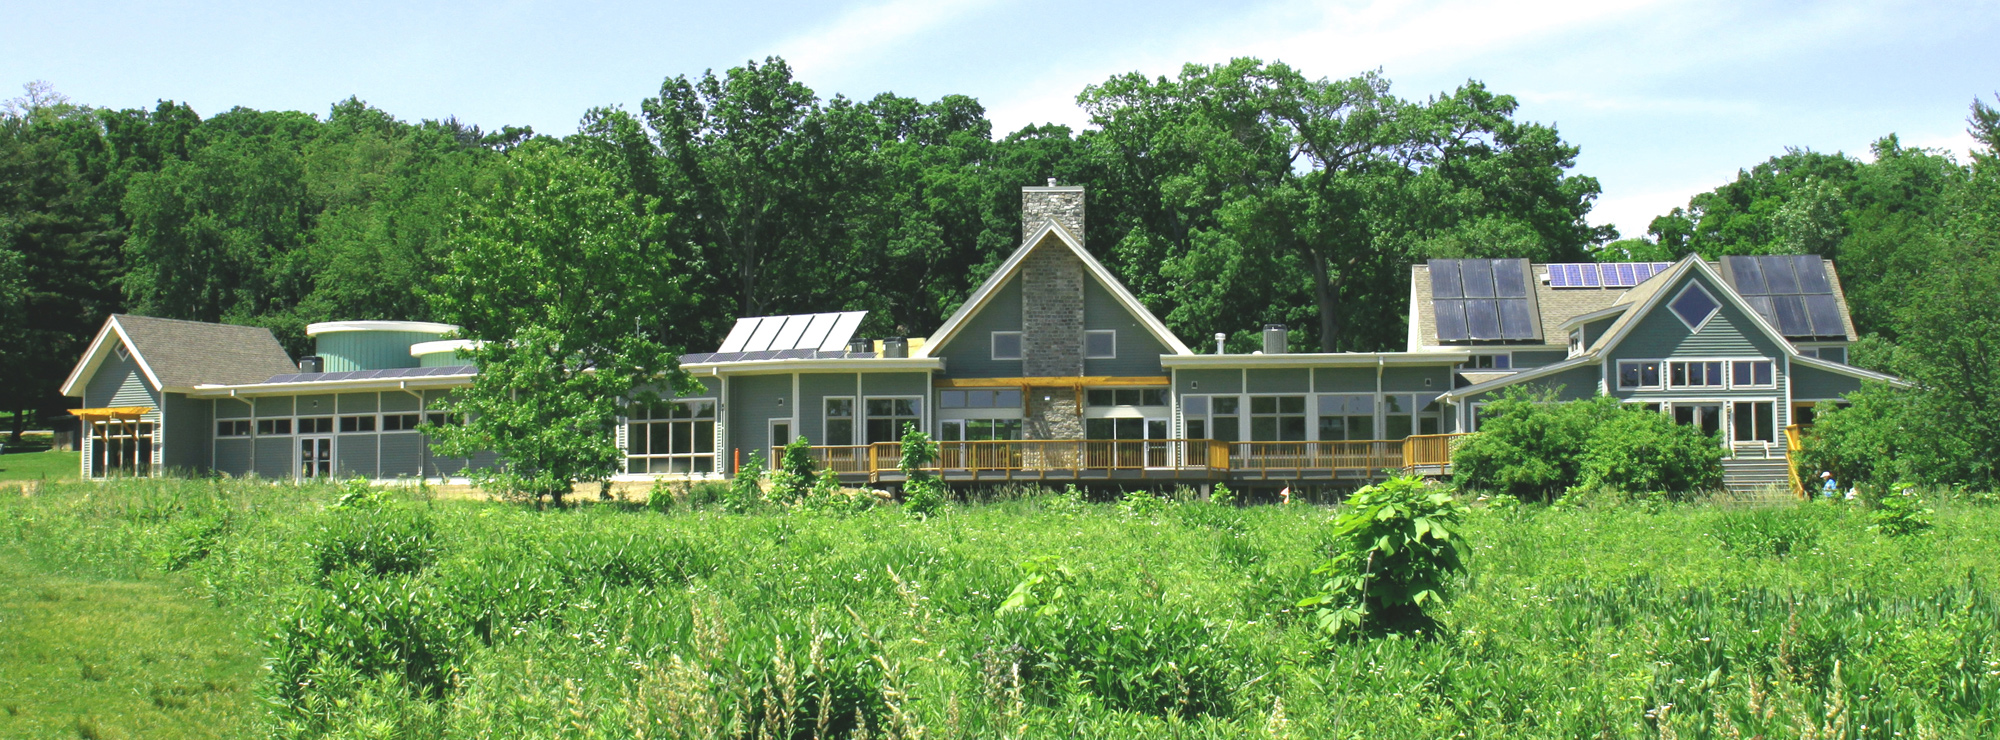 Aldo Leopold Nature Center. Photo credit: Nature Net